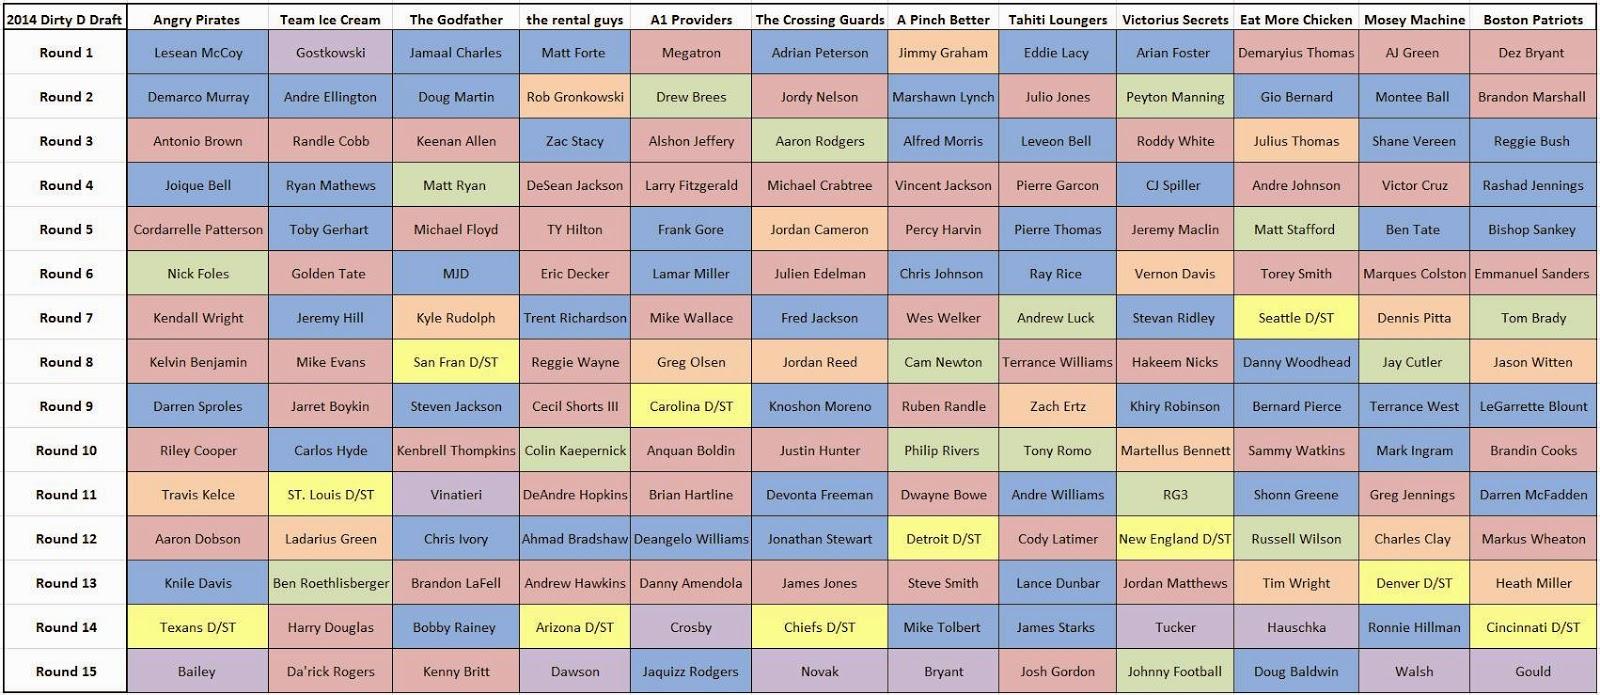 Nobody Wins on the Blue: 2014 Dirty D Draft Recap, Ranks